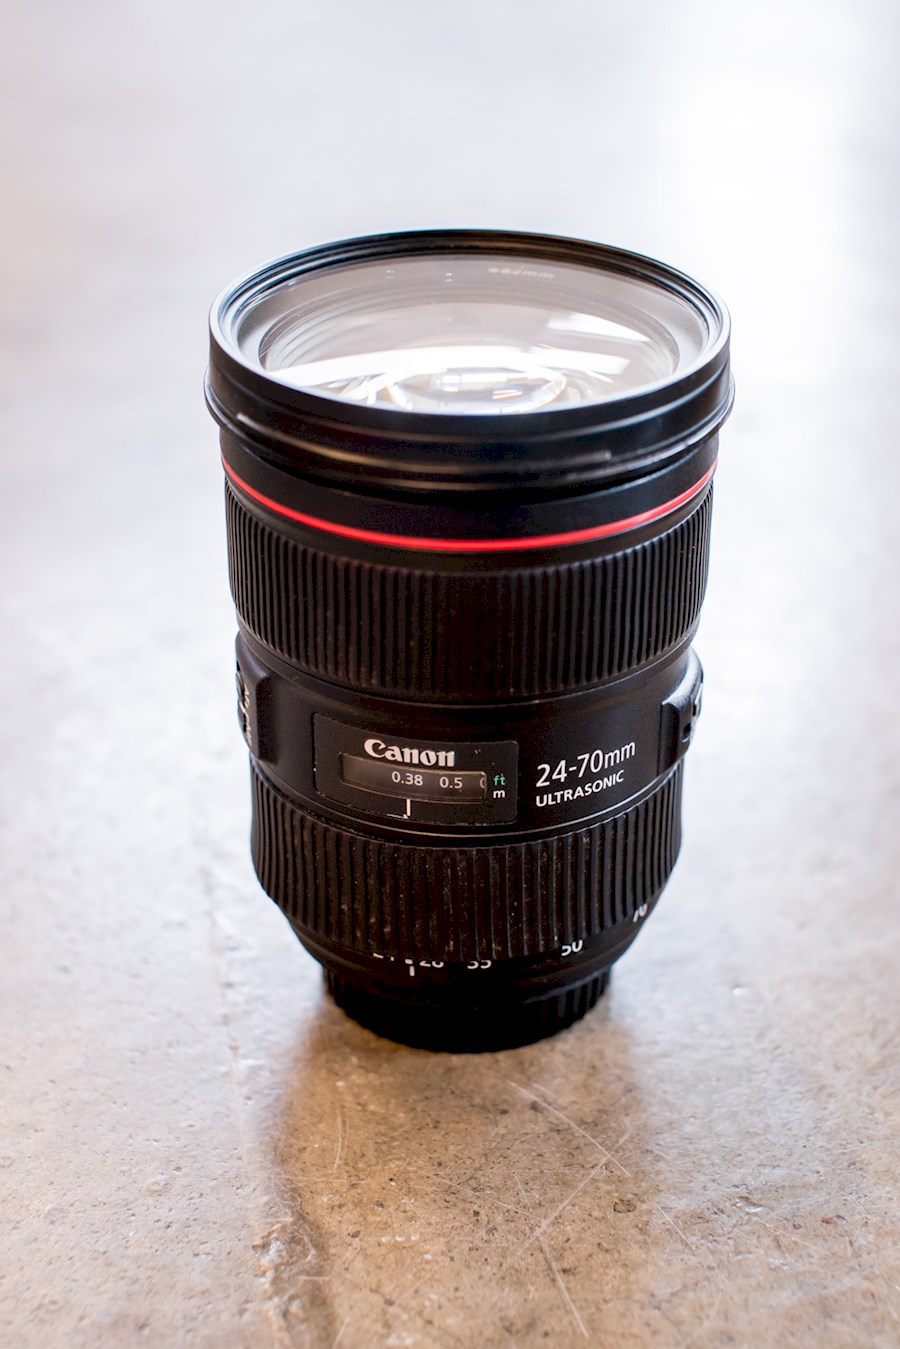 Rent a Canon 24-70 f2.8 in Amsterdam from Riske